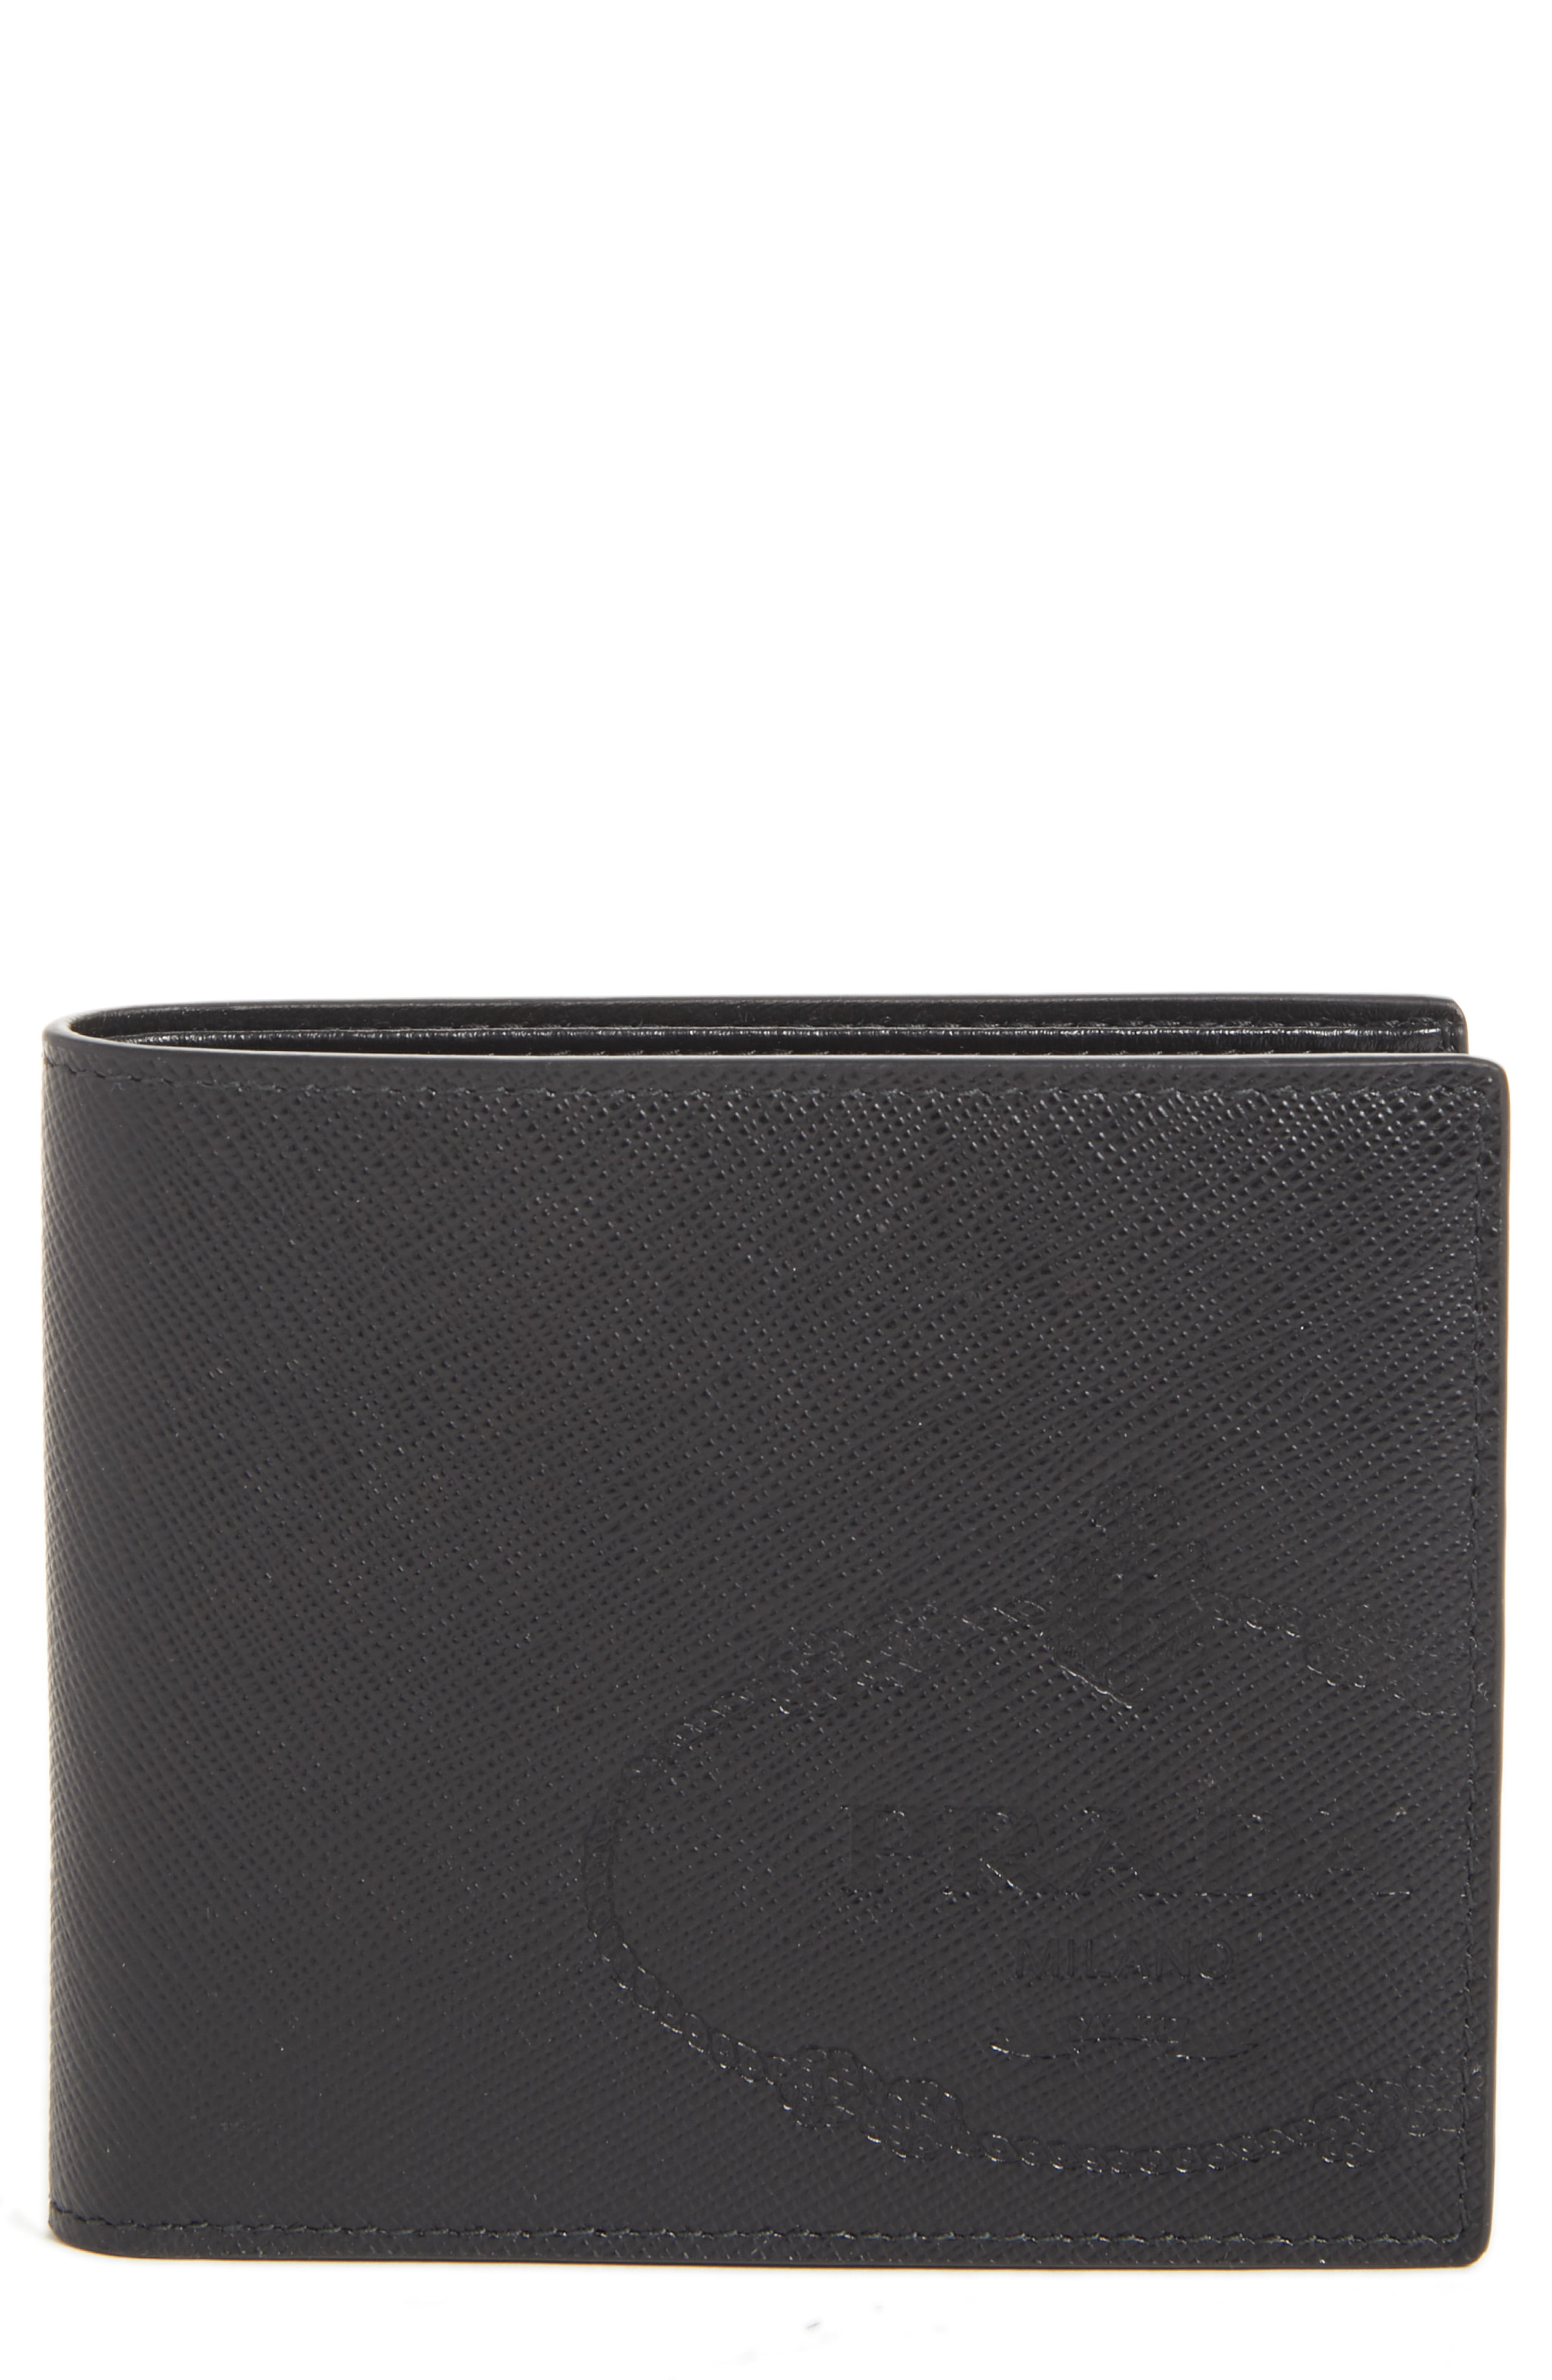 7adf0551 Men's Prada Saffiano Leather Bifold Wallet -